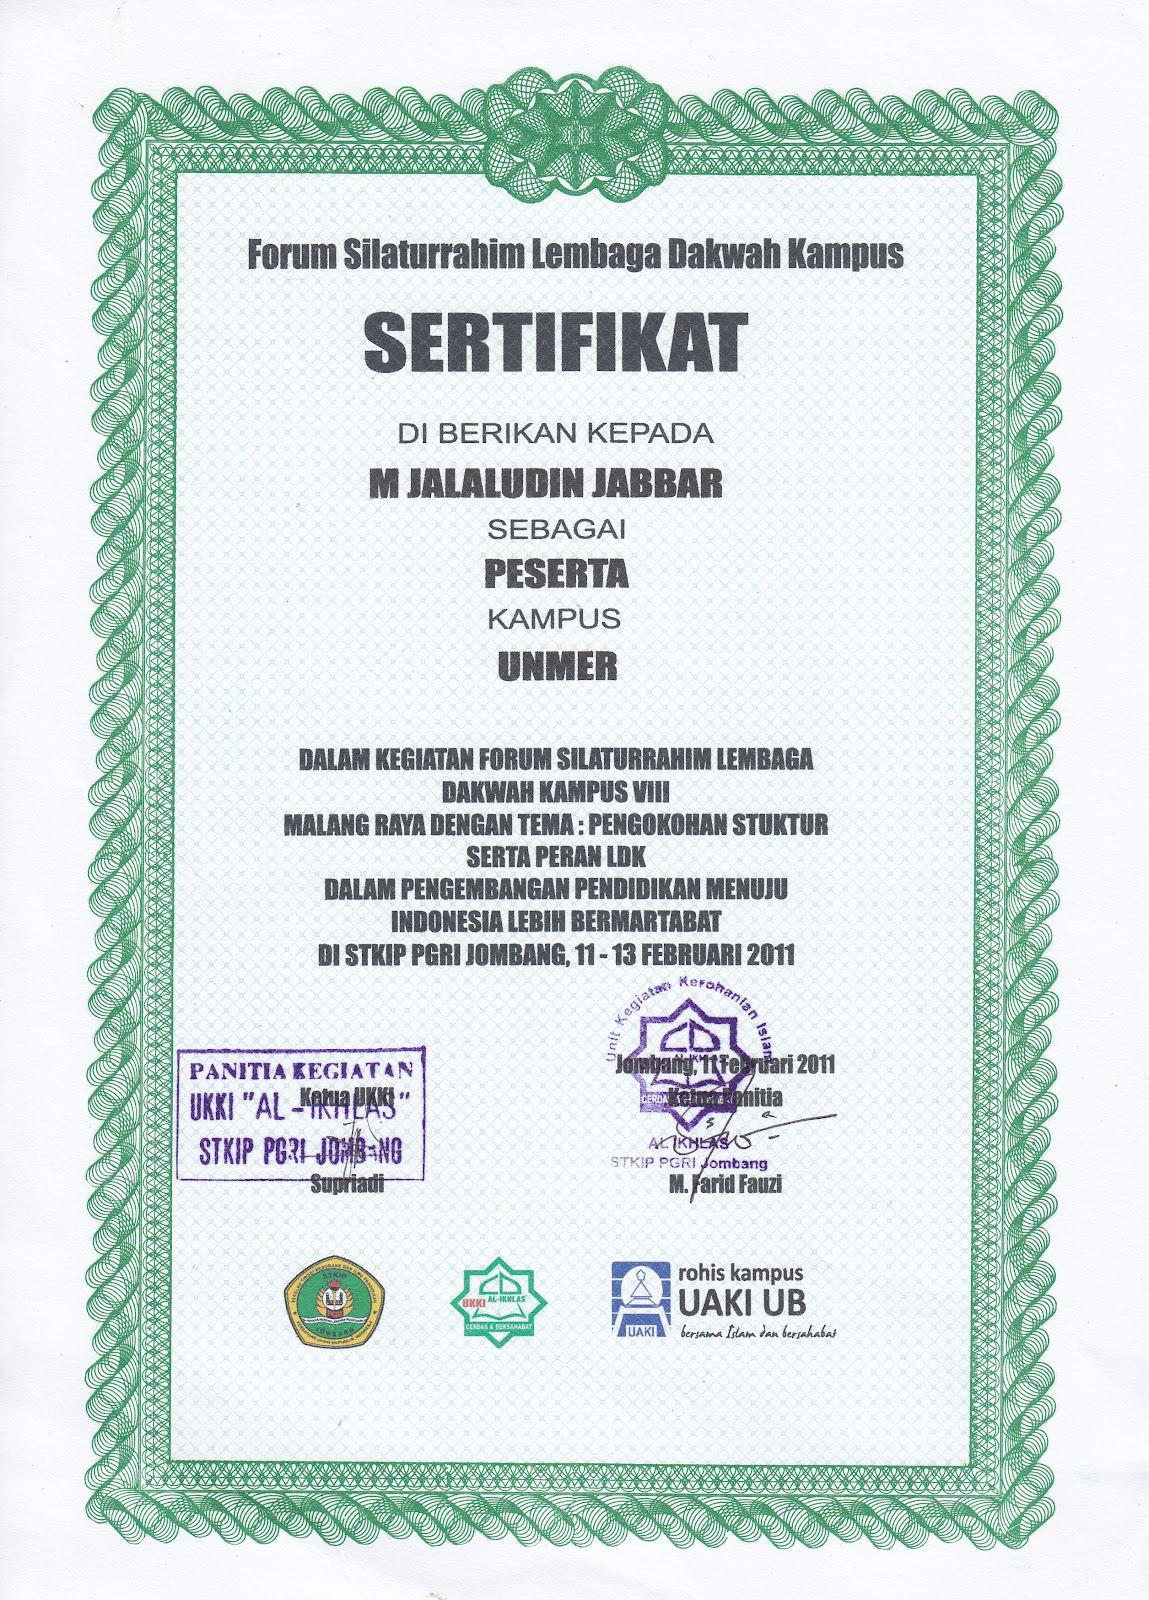 catatan jalal  piagam penghargaan dan sertifikat